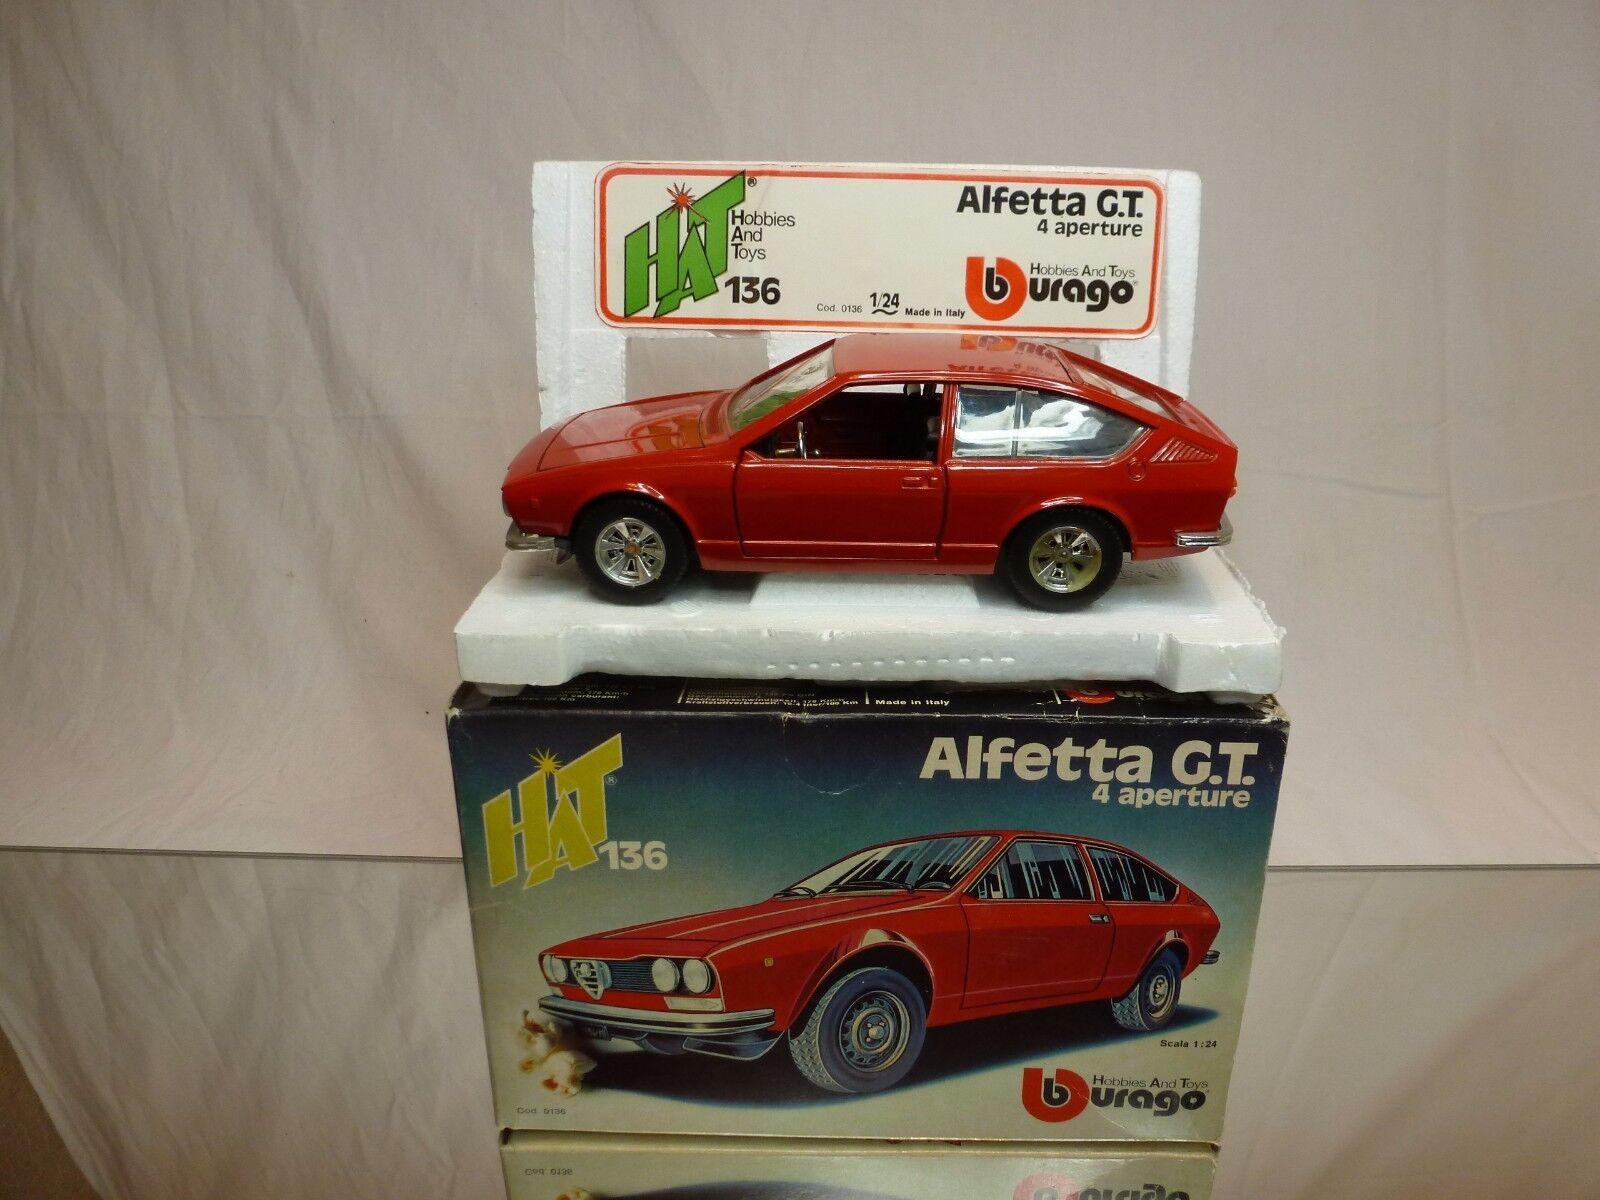 BBURAGO 0136 ALFA ROMEO ALFETTA GT - RED 1:24 VERY RARE - VERY GOOD IN BOX